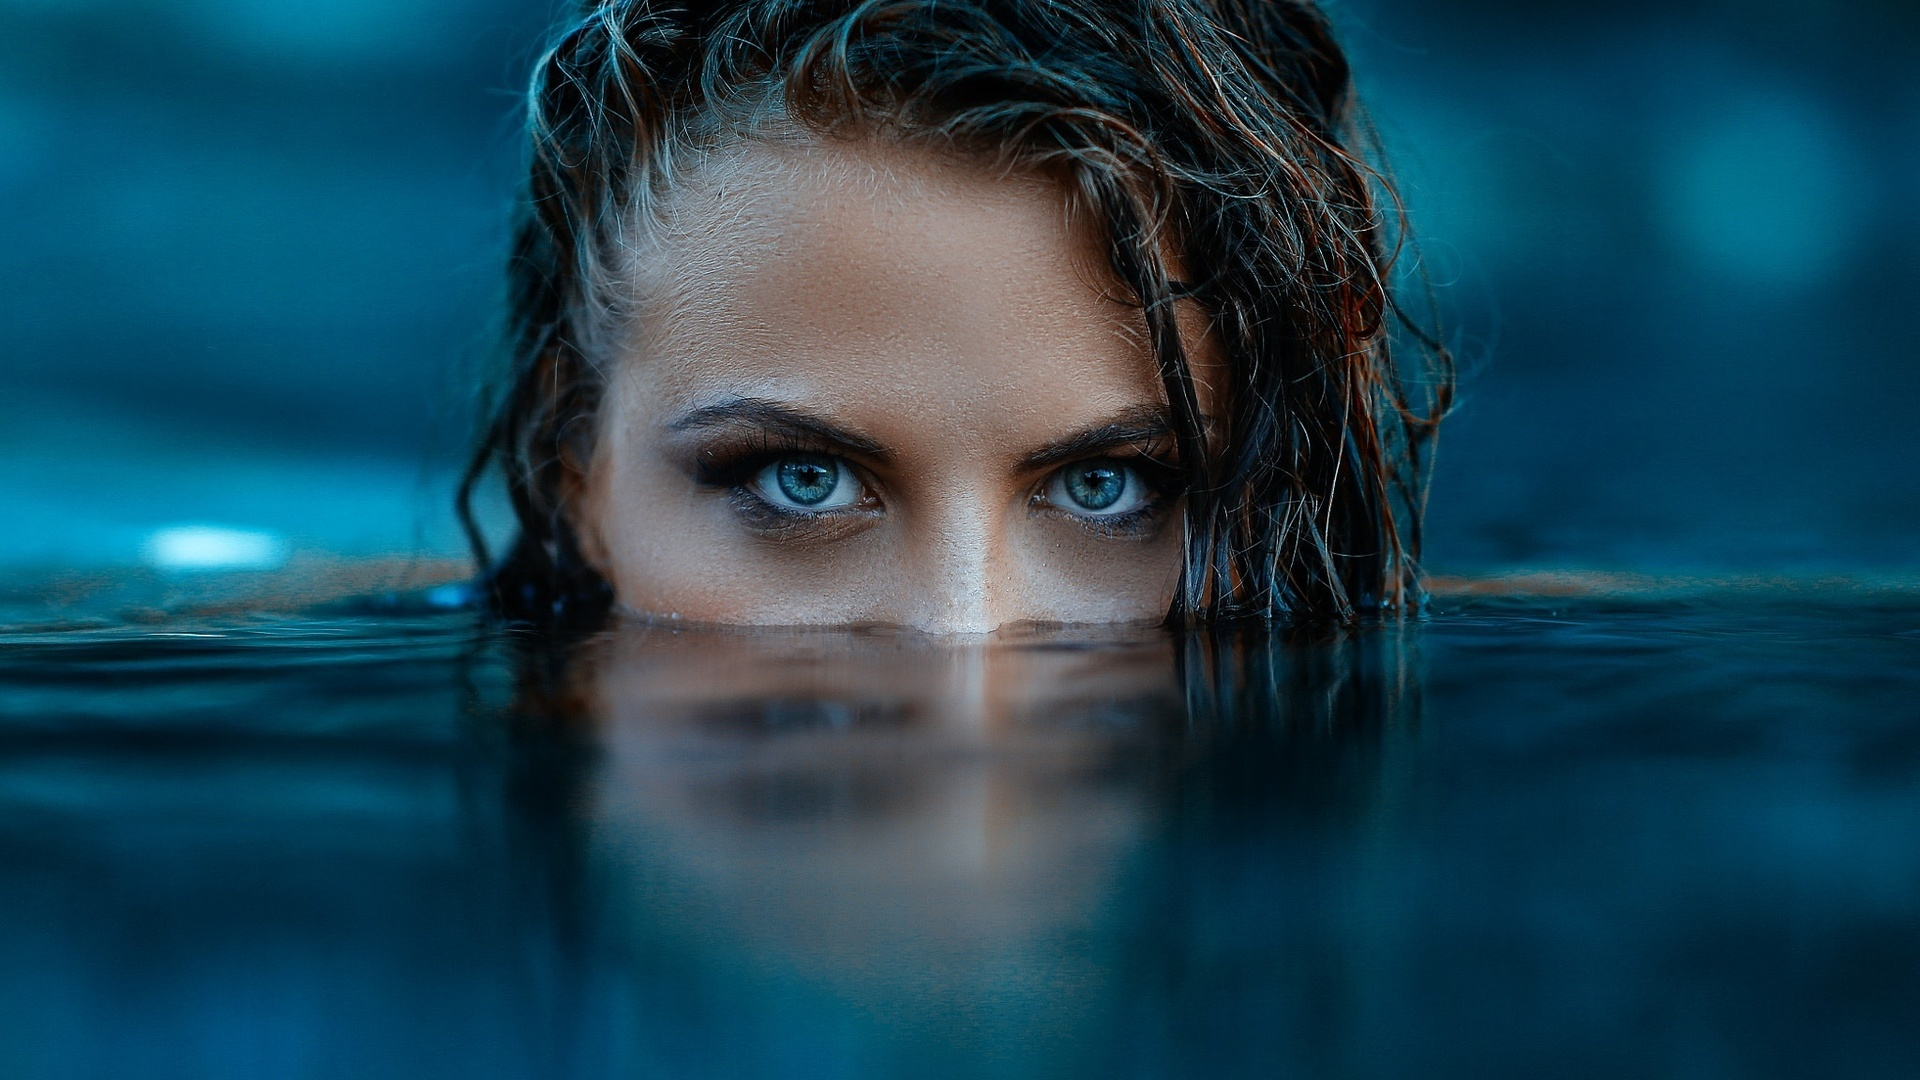 решили красивое фото девушек в воде новинки